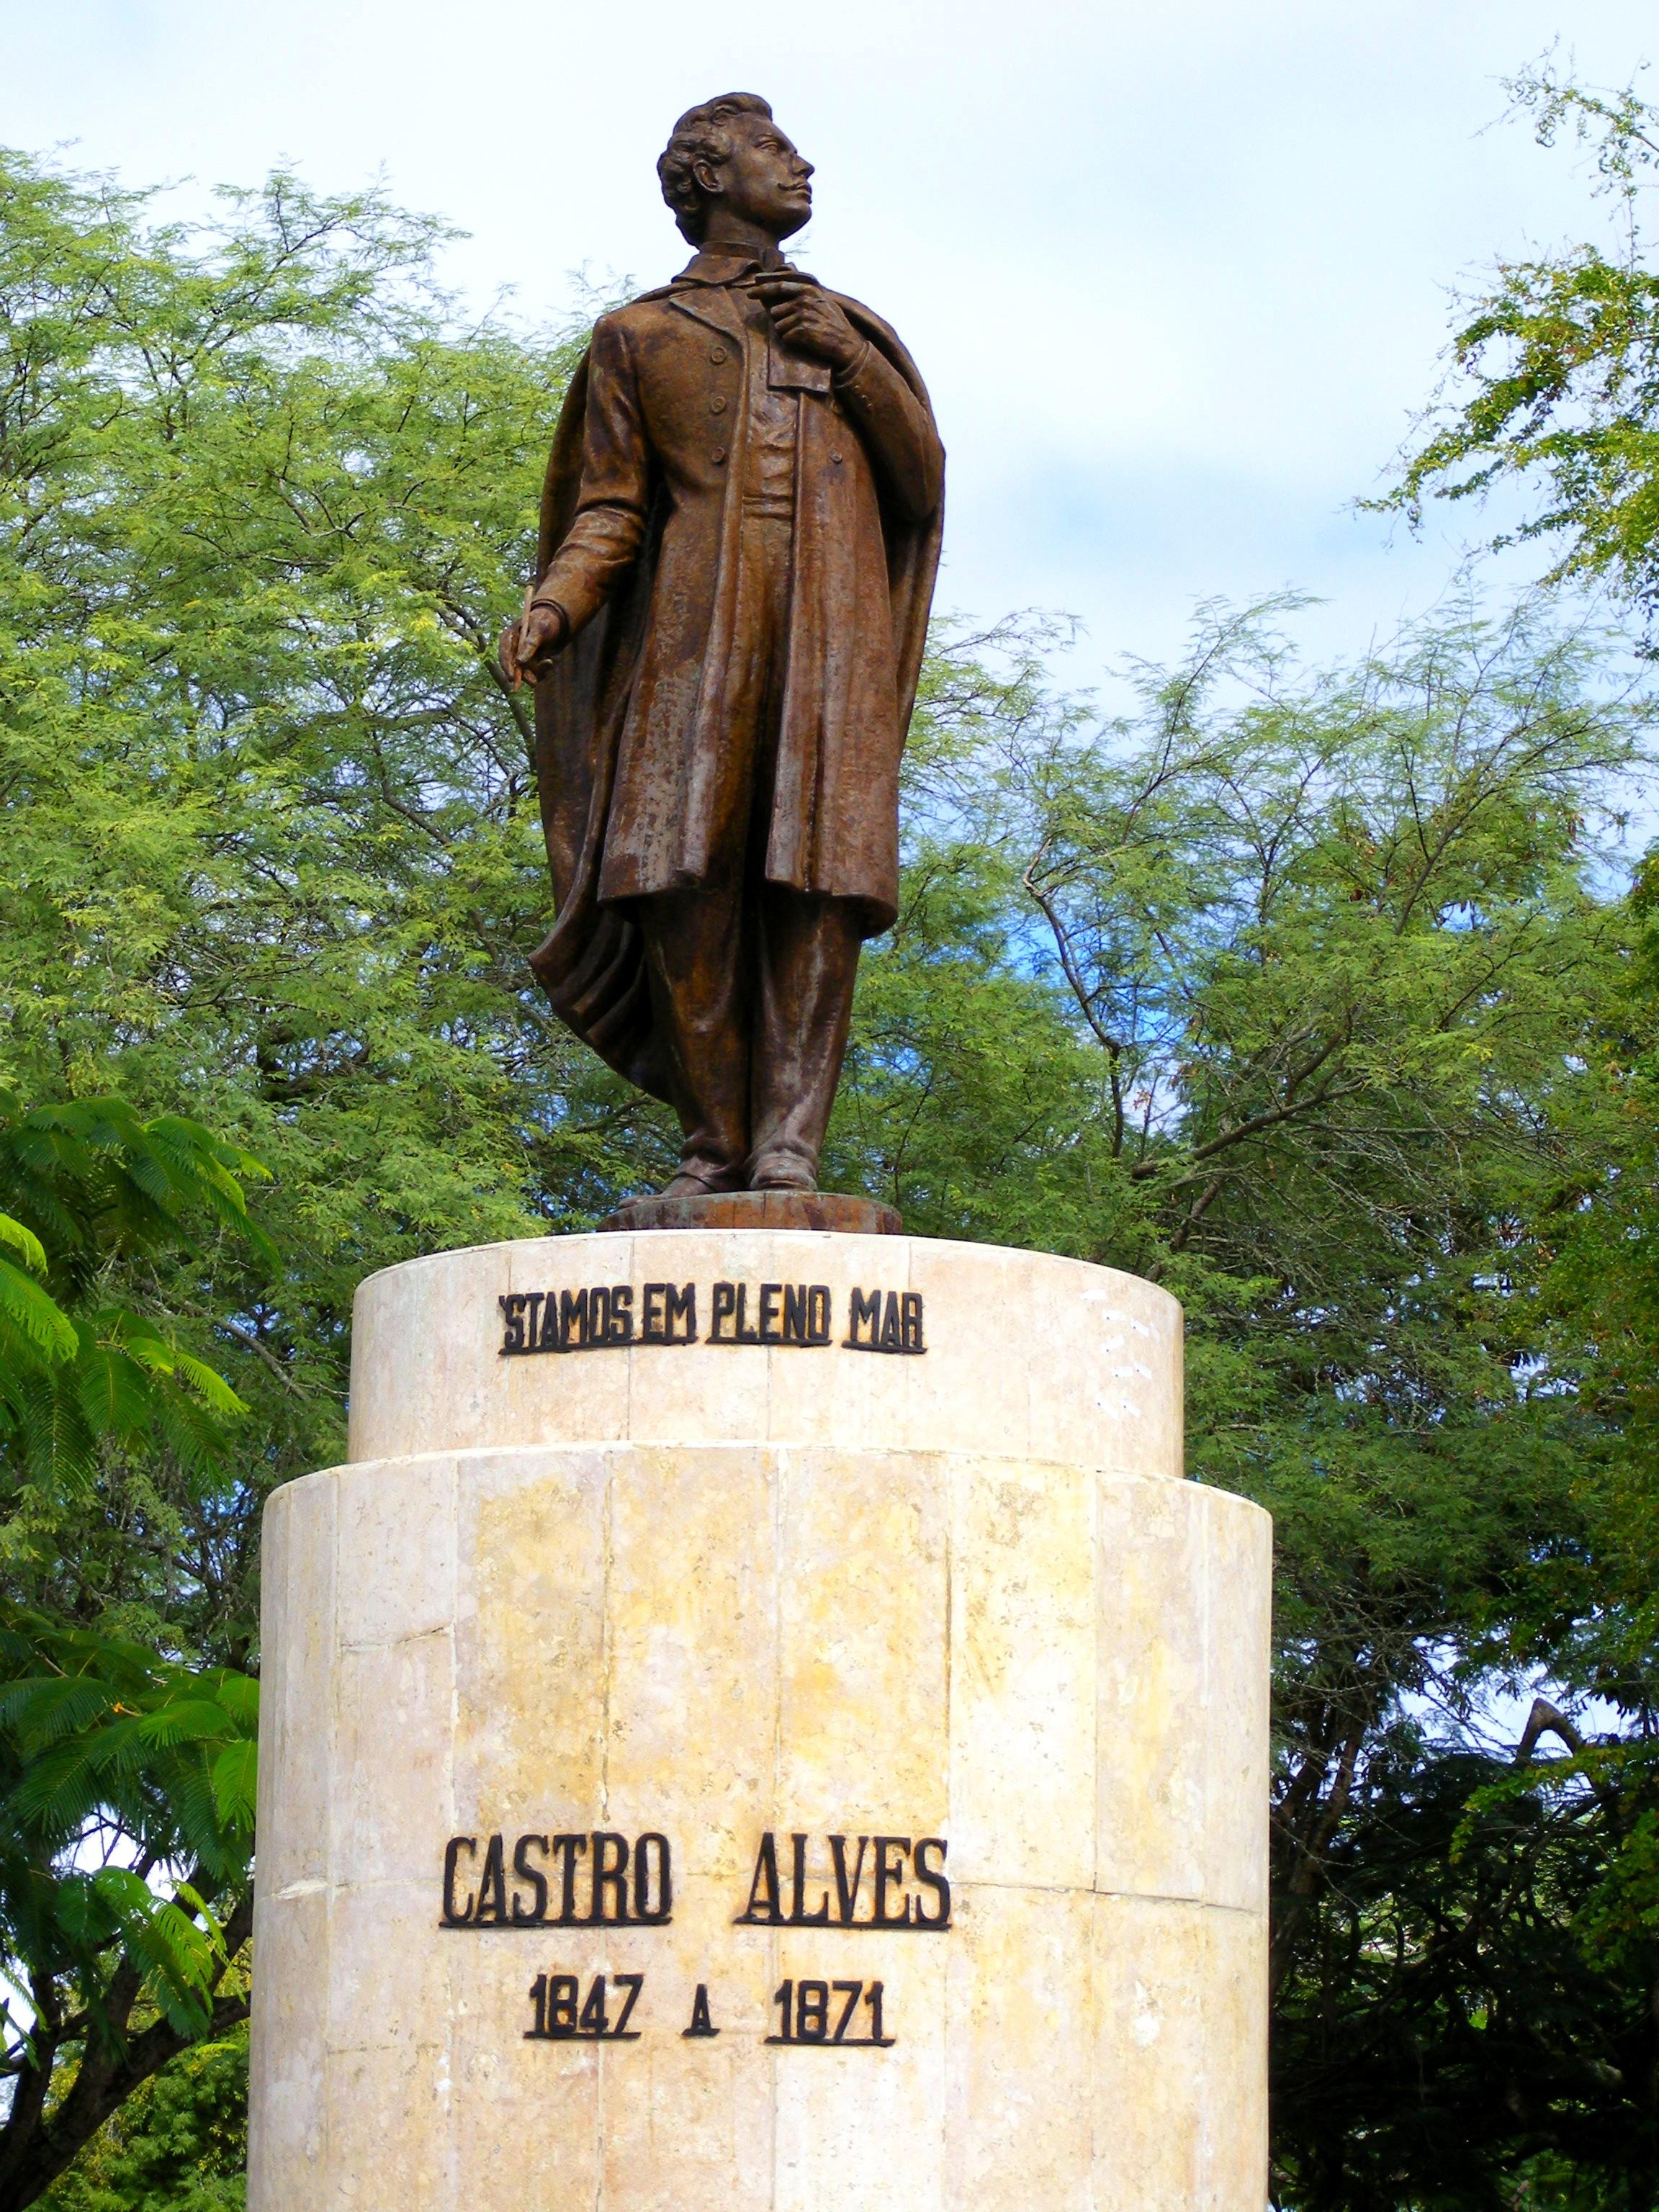 Castro Alves Bahia fonte: upload.wikimedia.org